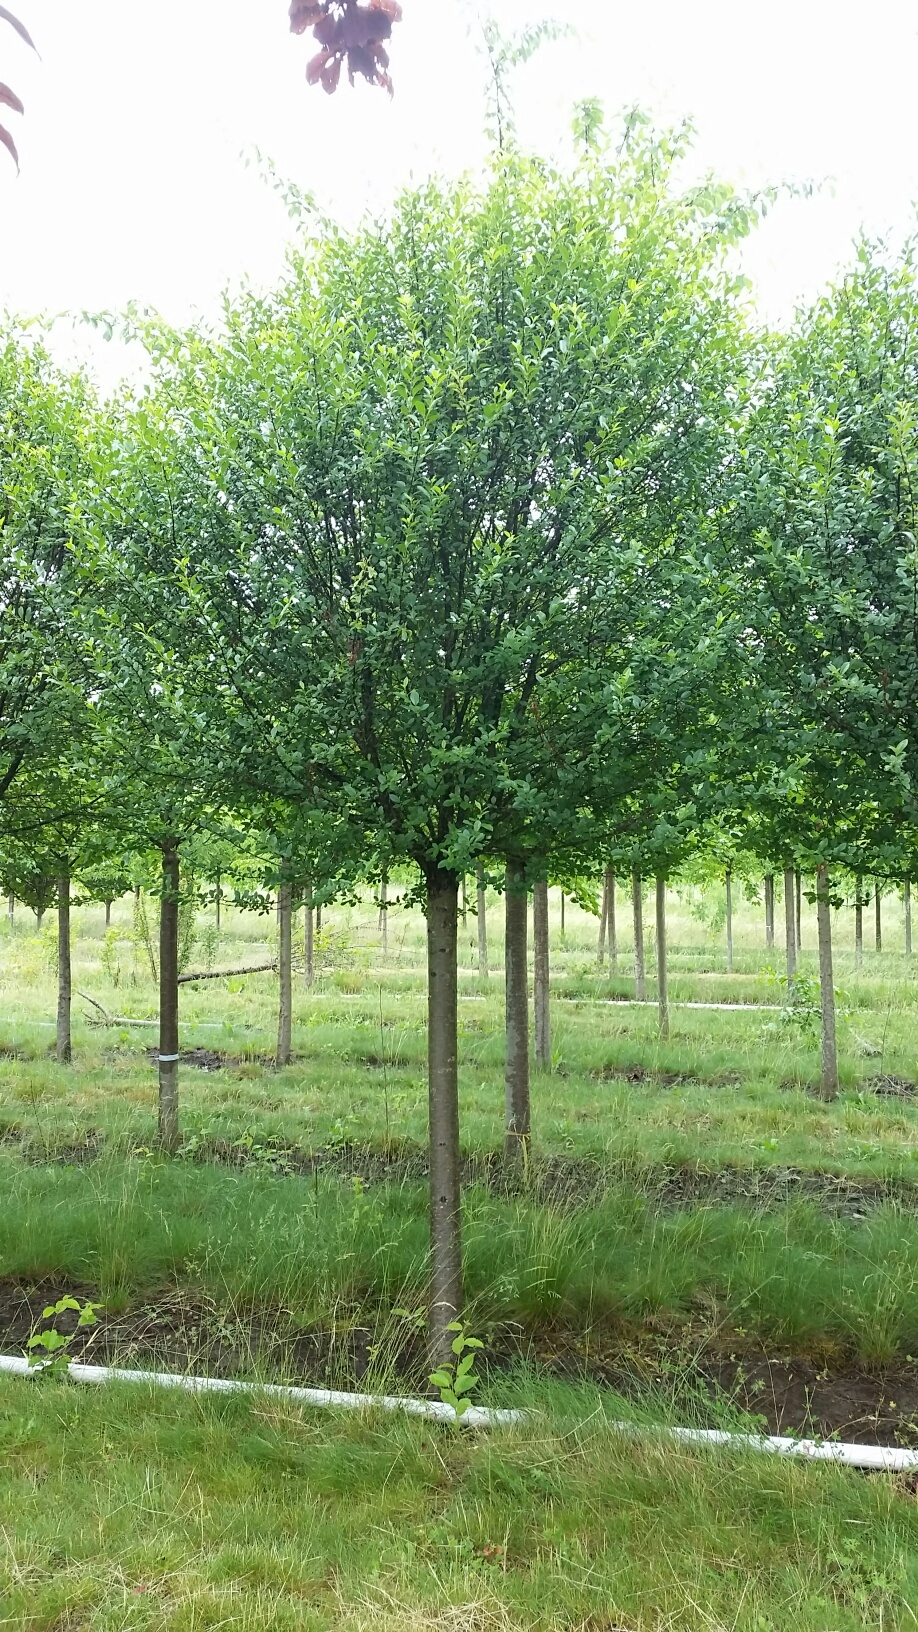 Prunus fr.  'Globosa' single tree detail